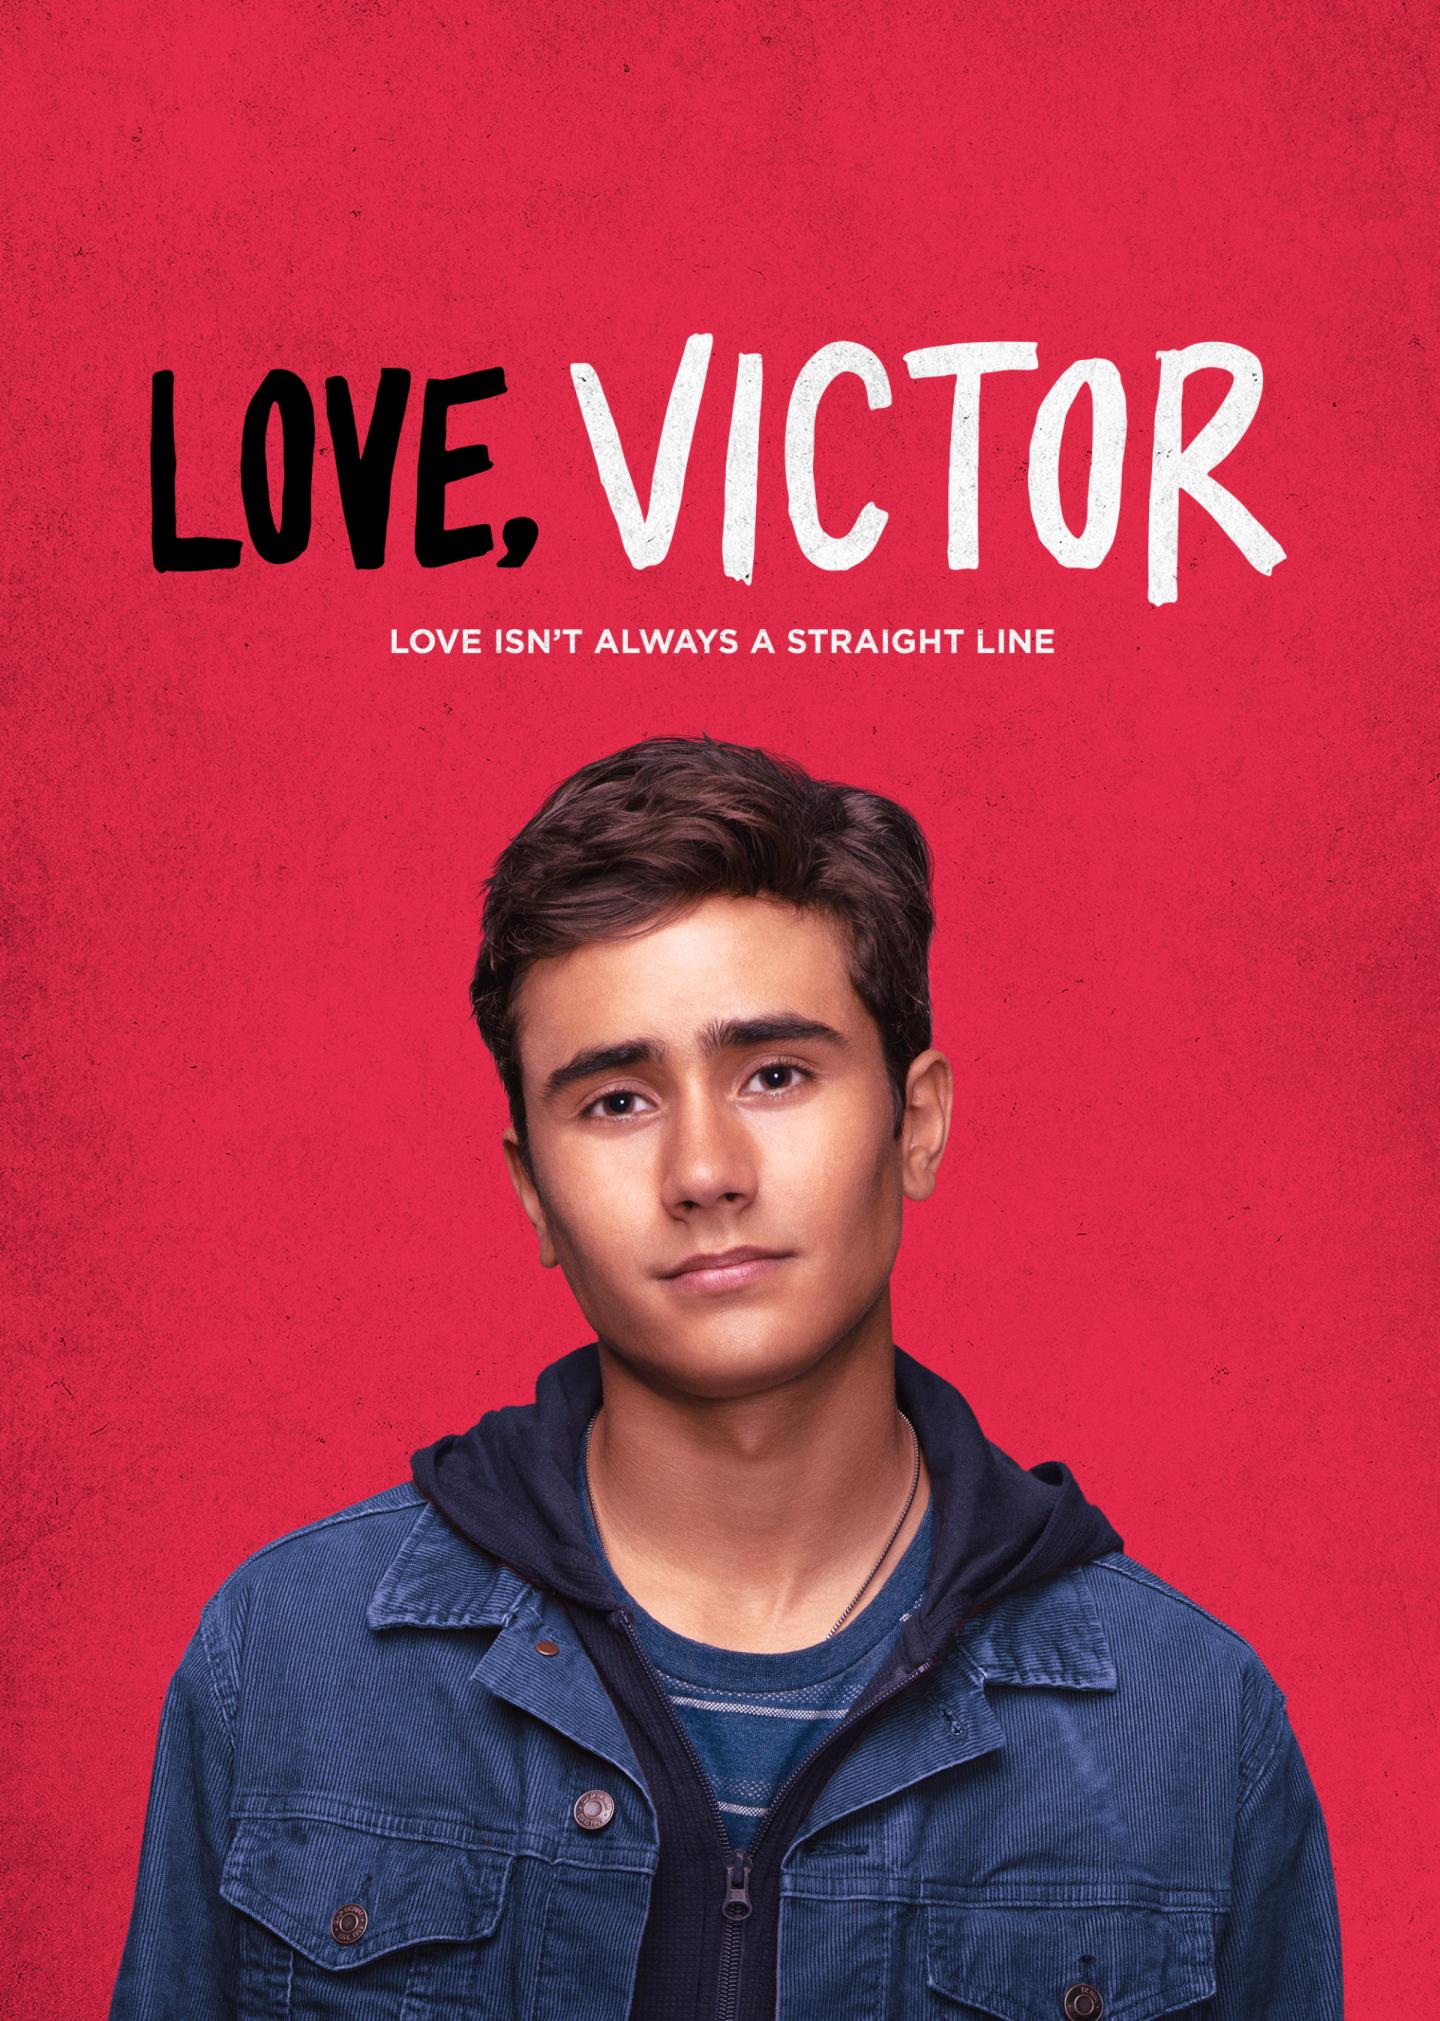 Love Victor image